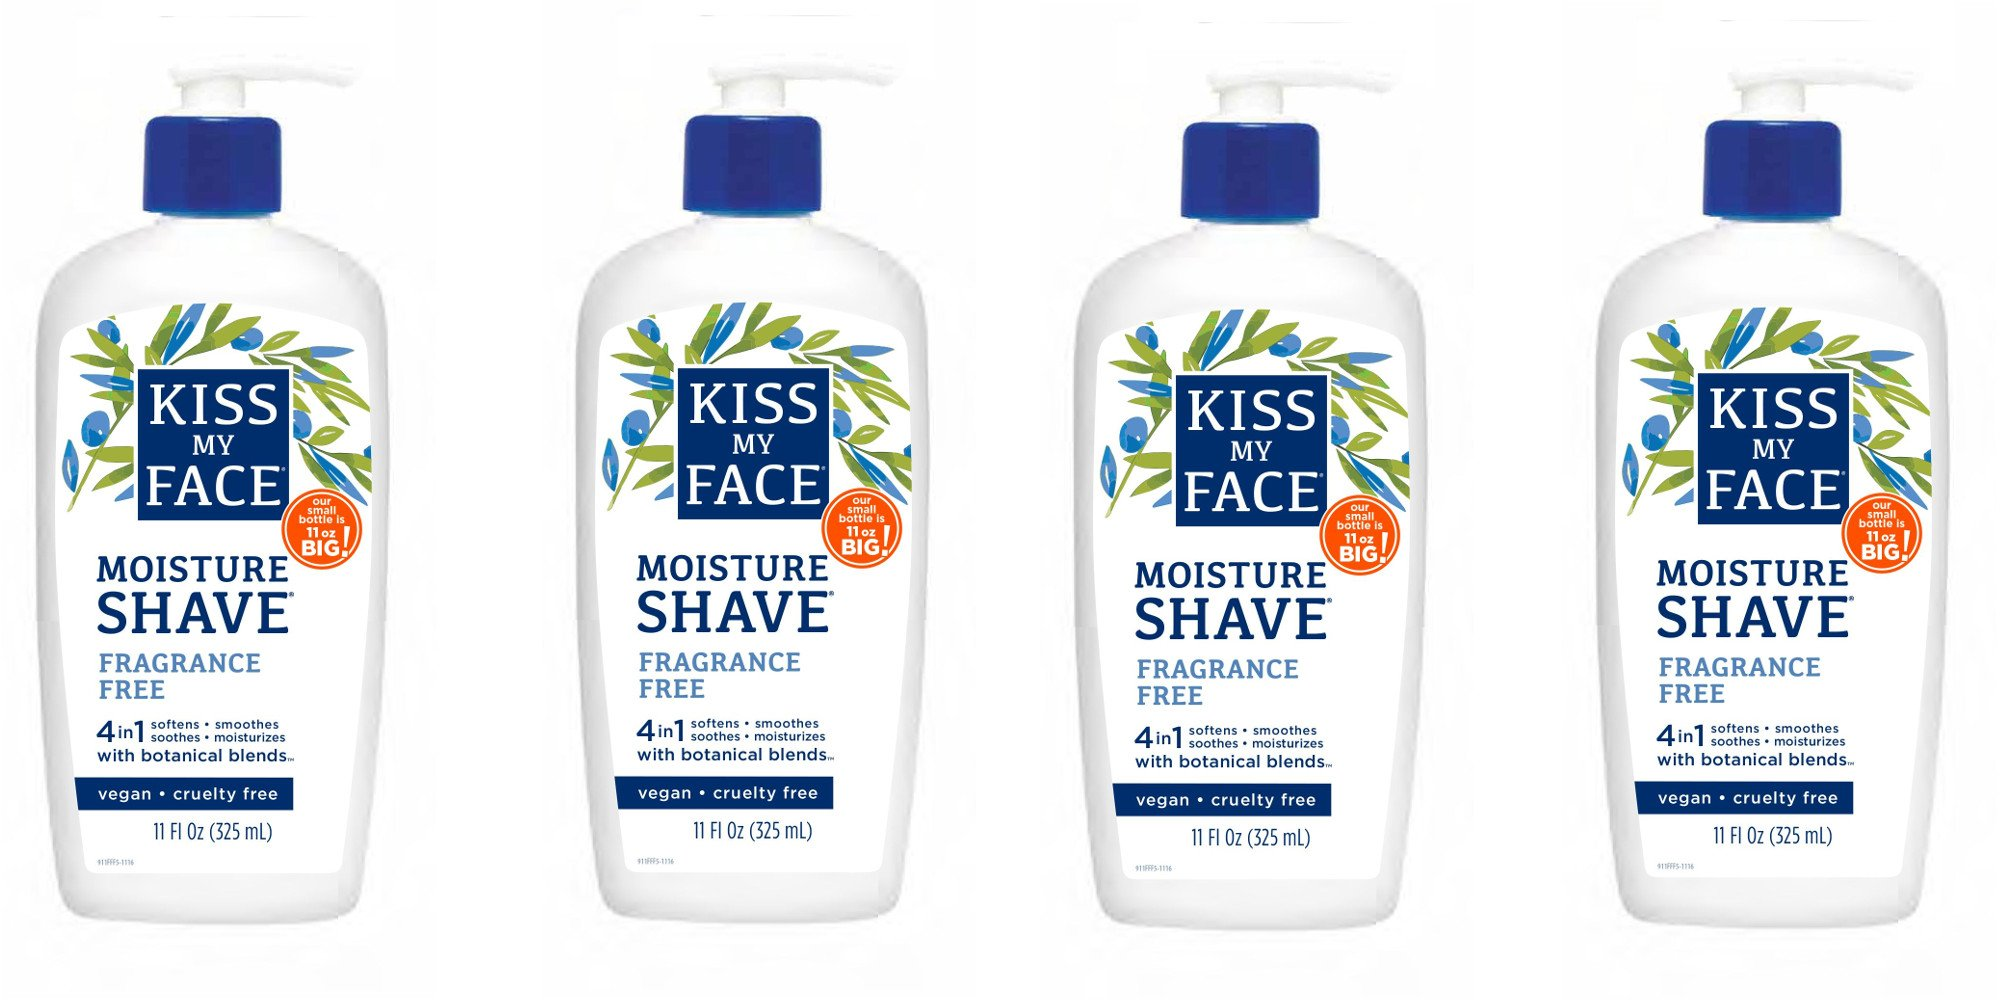 Kiss My Face Moisture Shave Shaving Cream, Olive and Aloe Fragrance Free Shaving Soap for Sensitive Skin, 11 oz Pumps (Pack of 4)